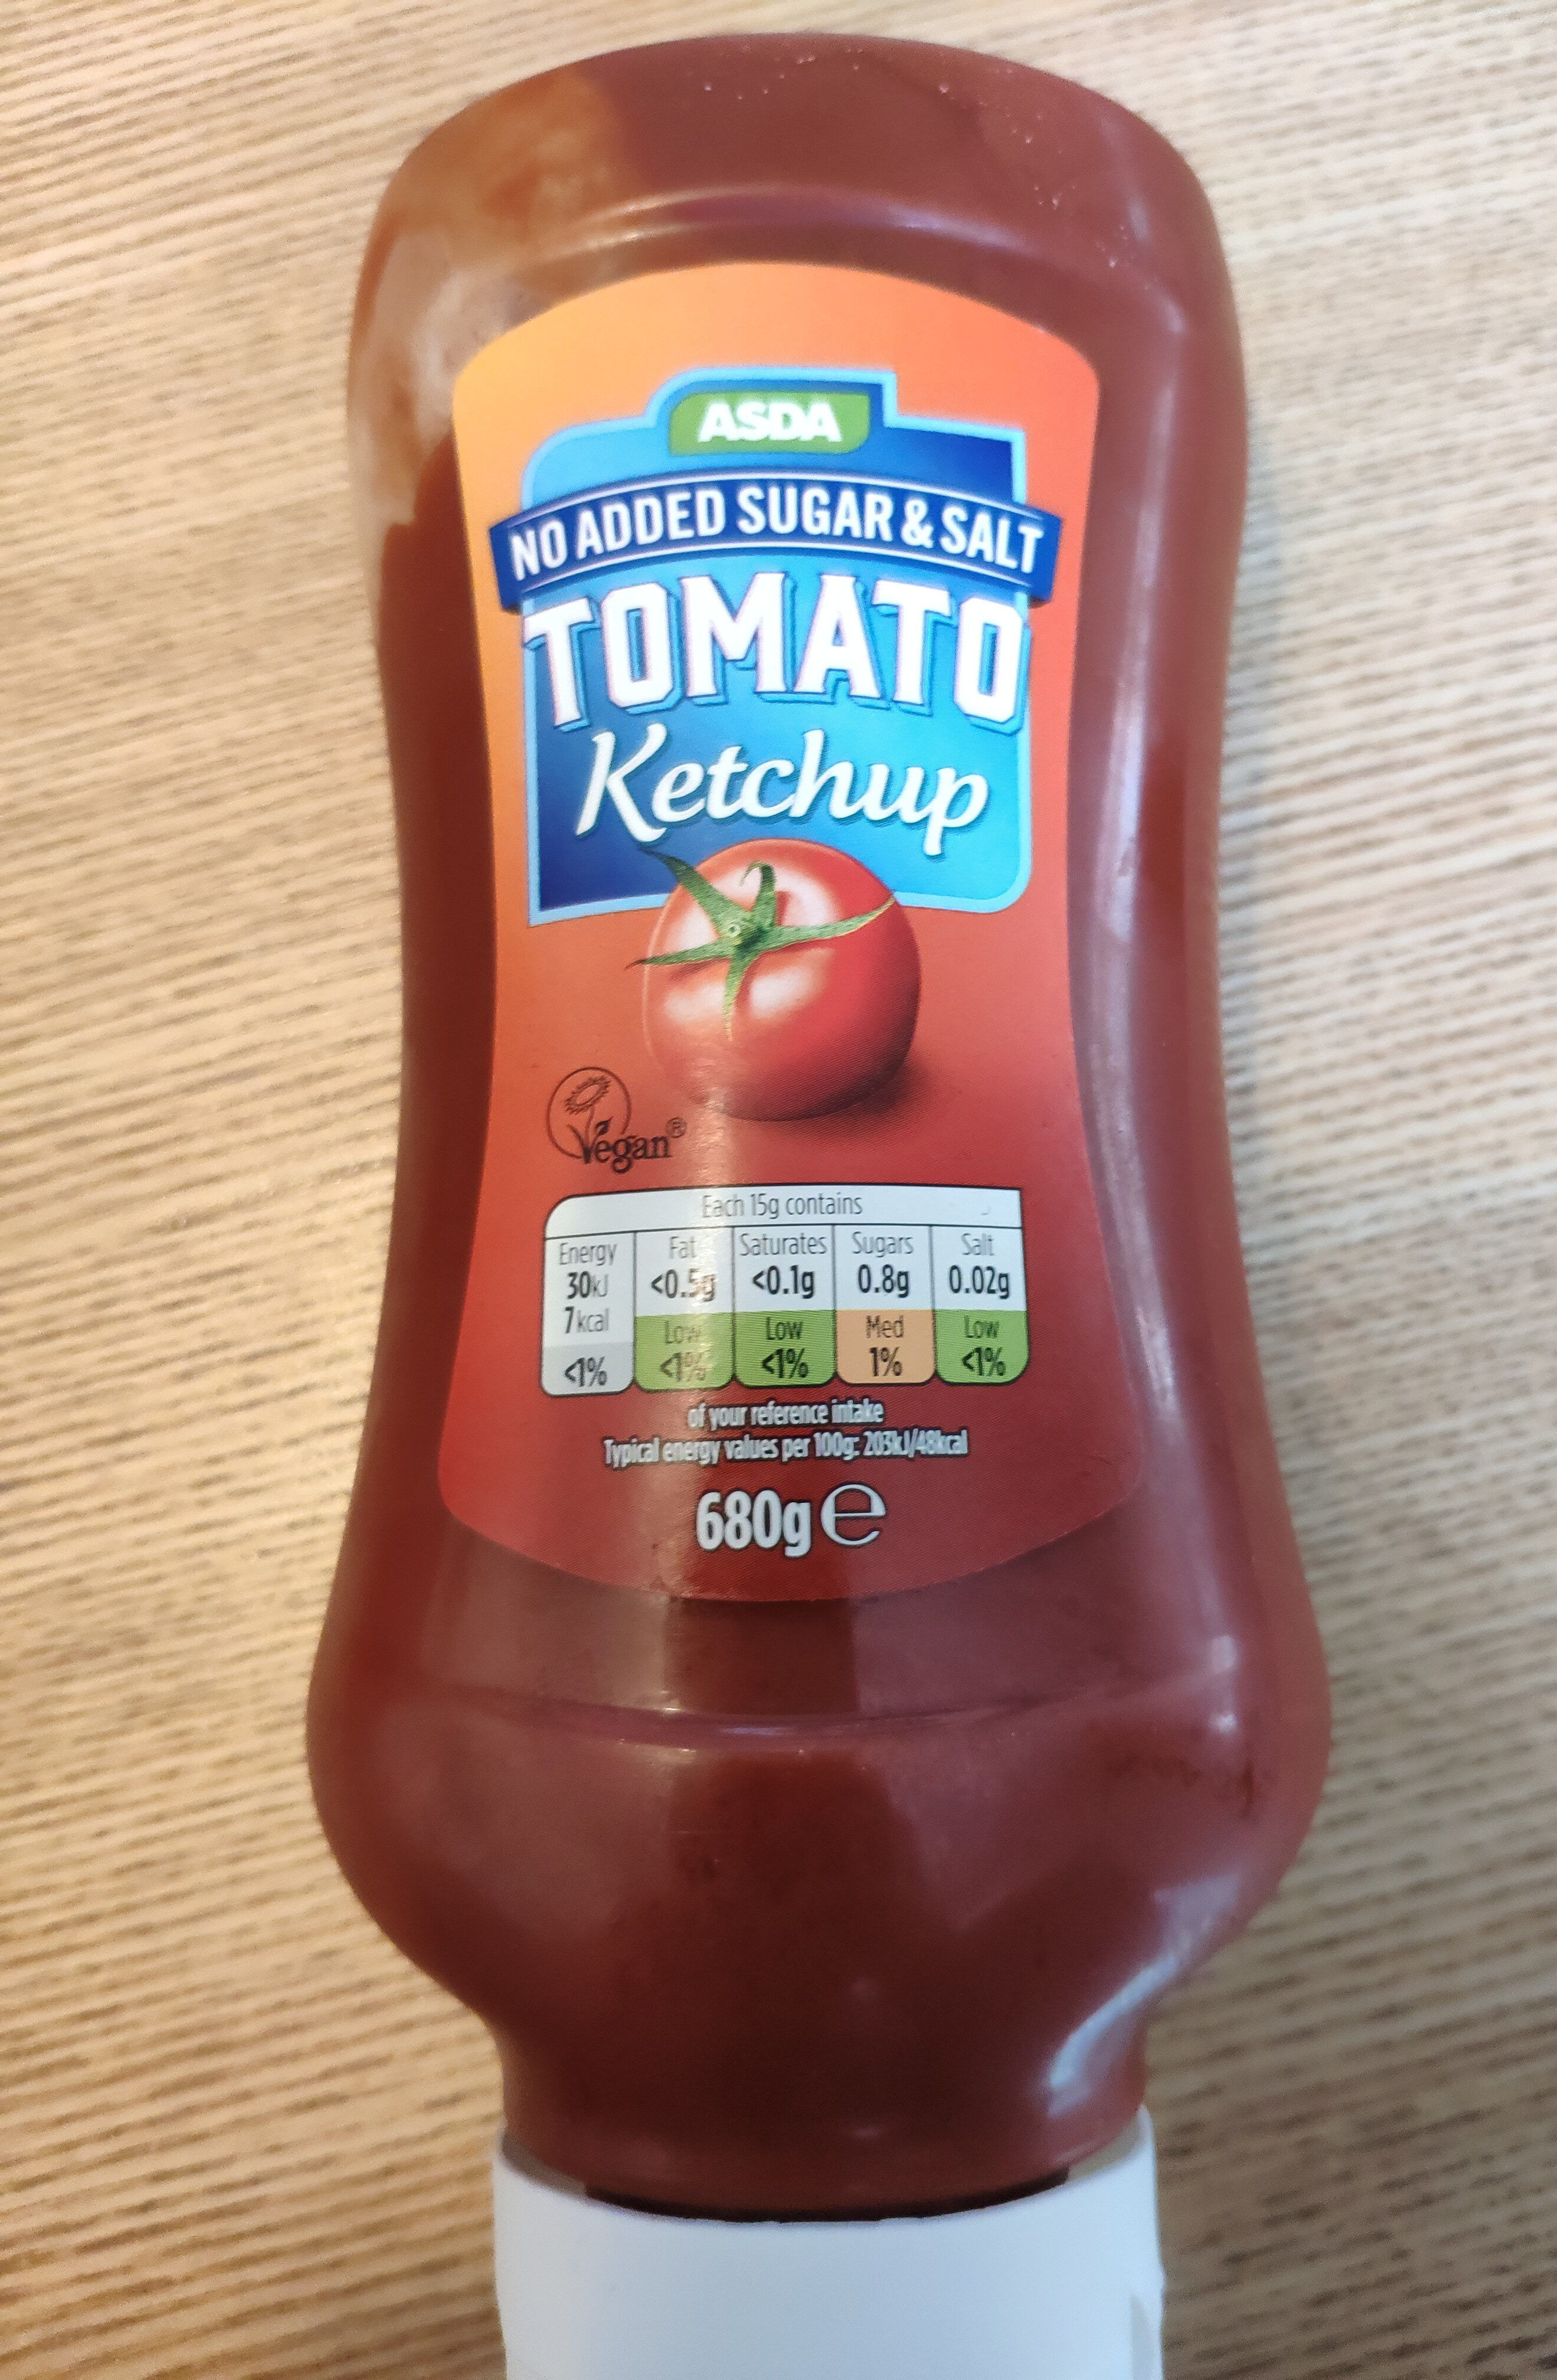 No added Sugar & Salt Tomato Ketchup - Product - en